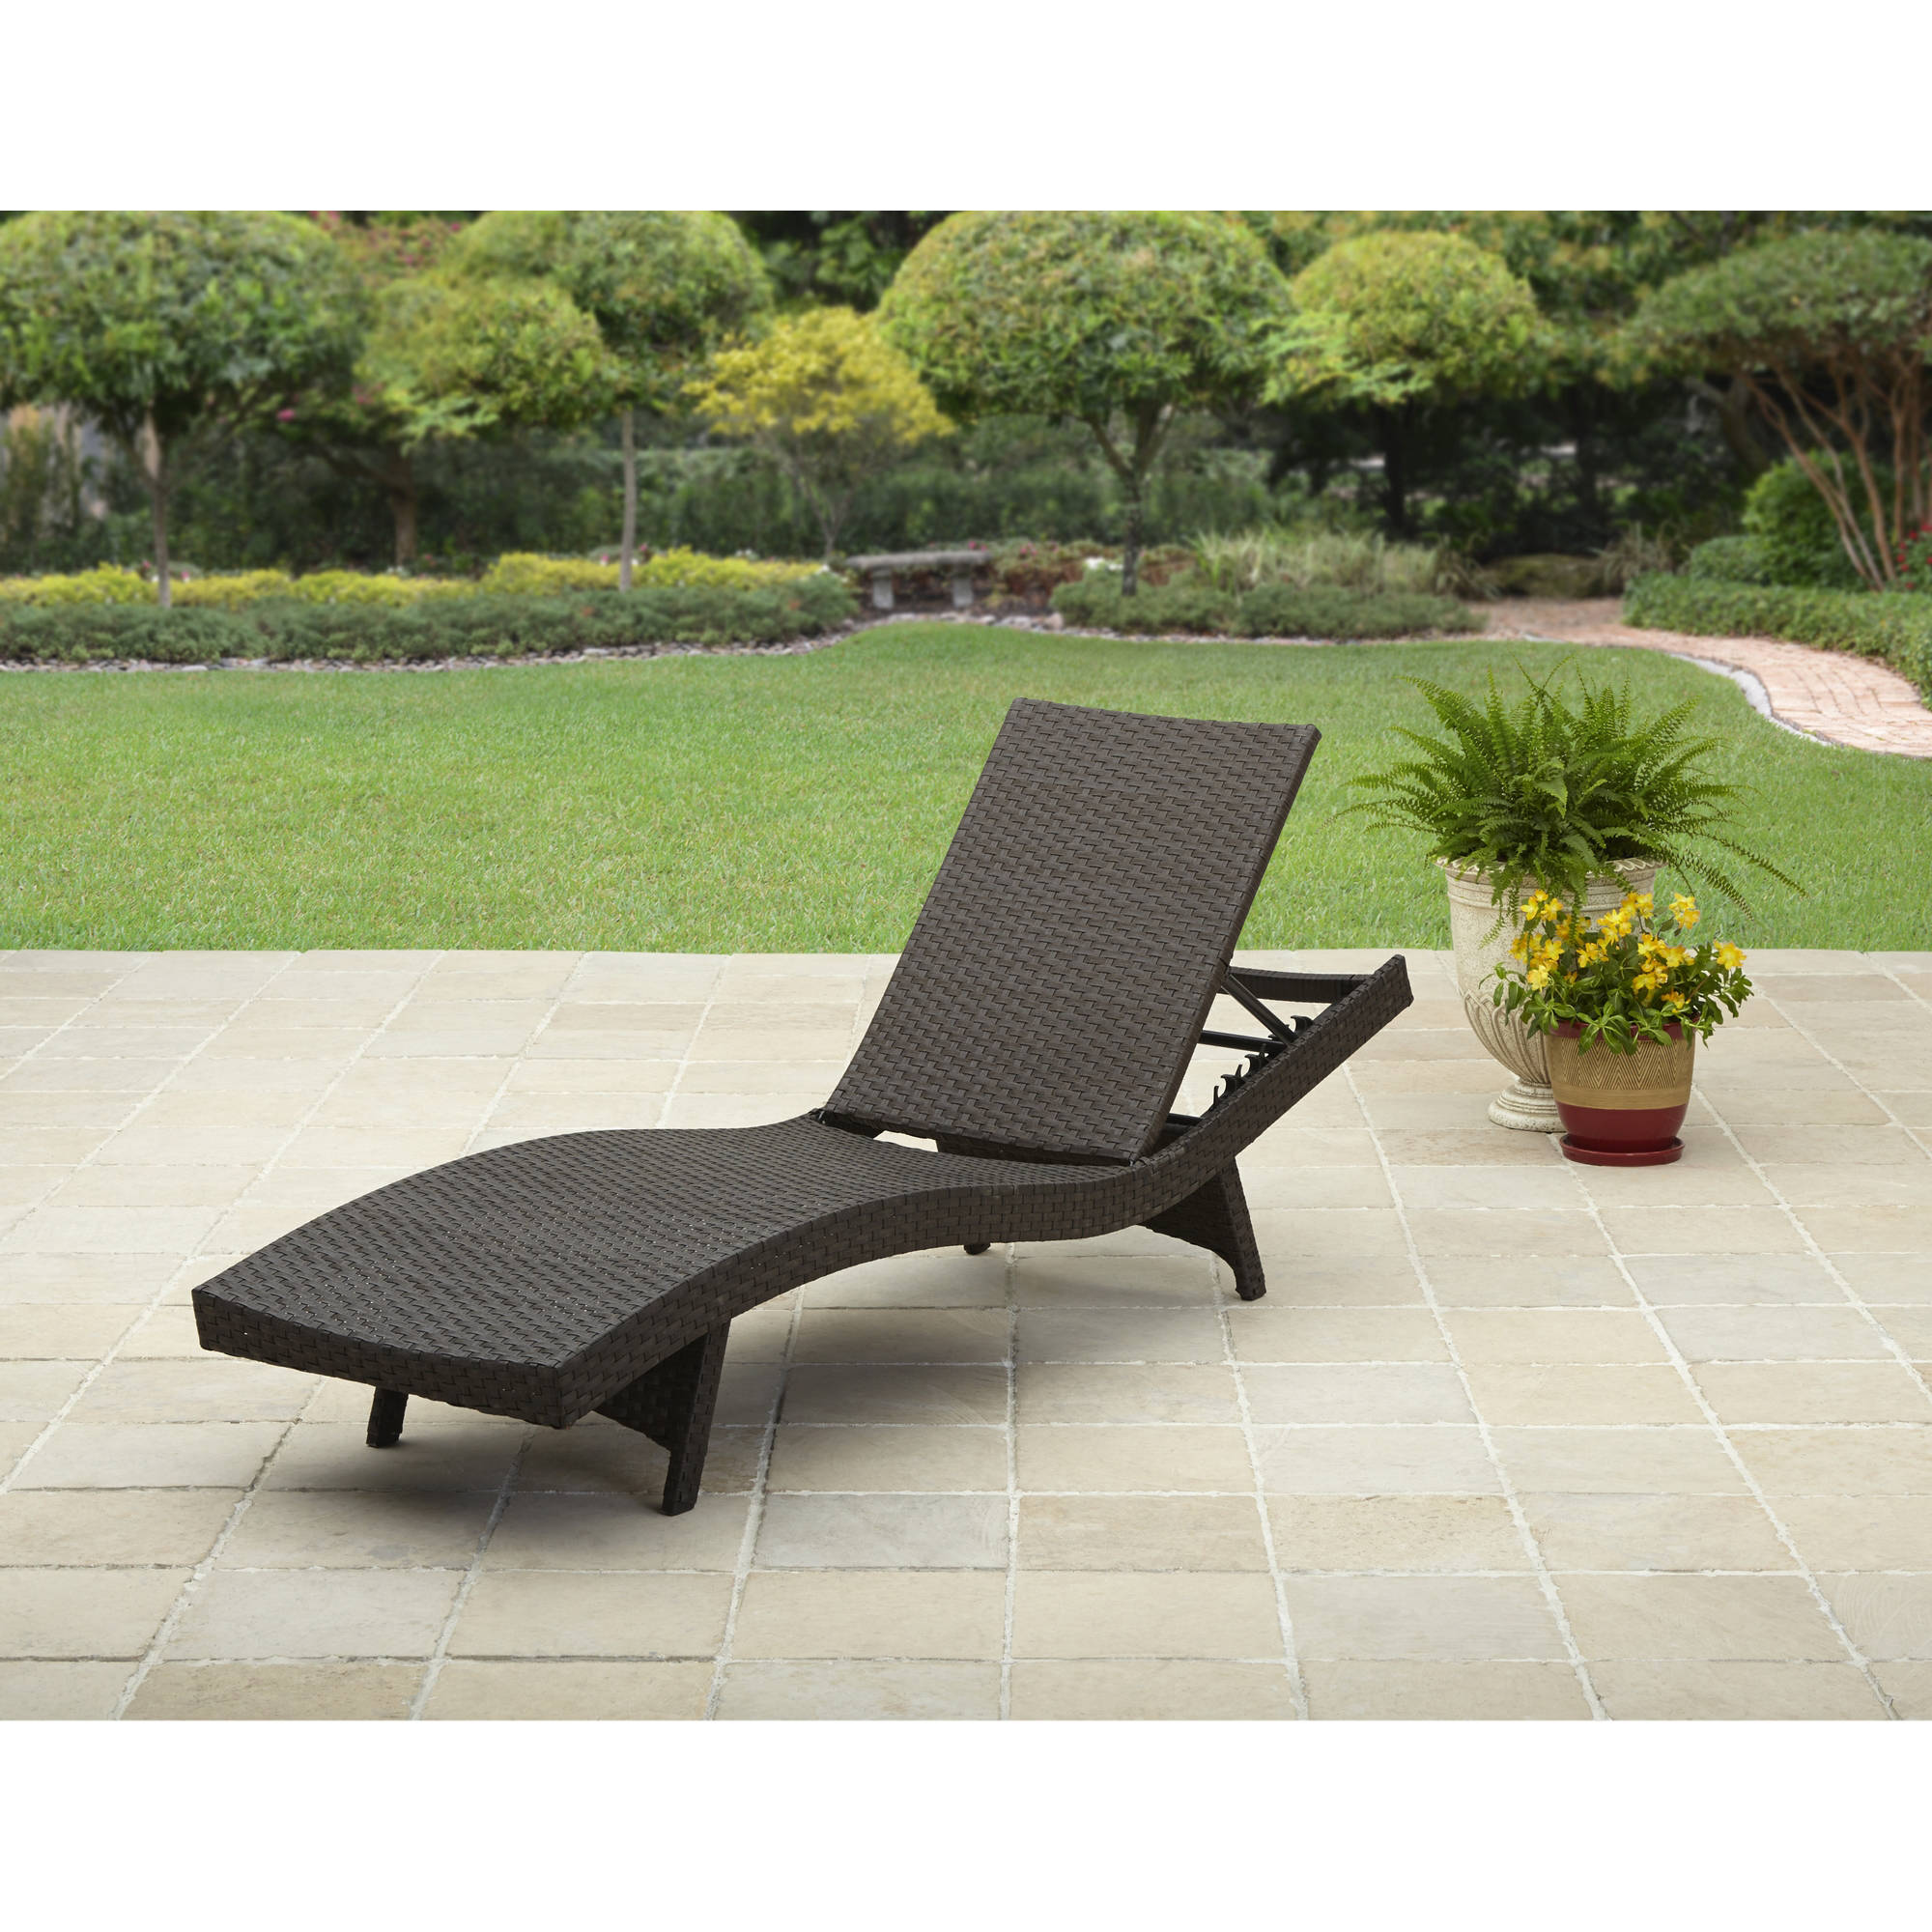 Garden furniture patio furniture - walmart.com GUNIOIL